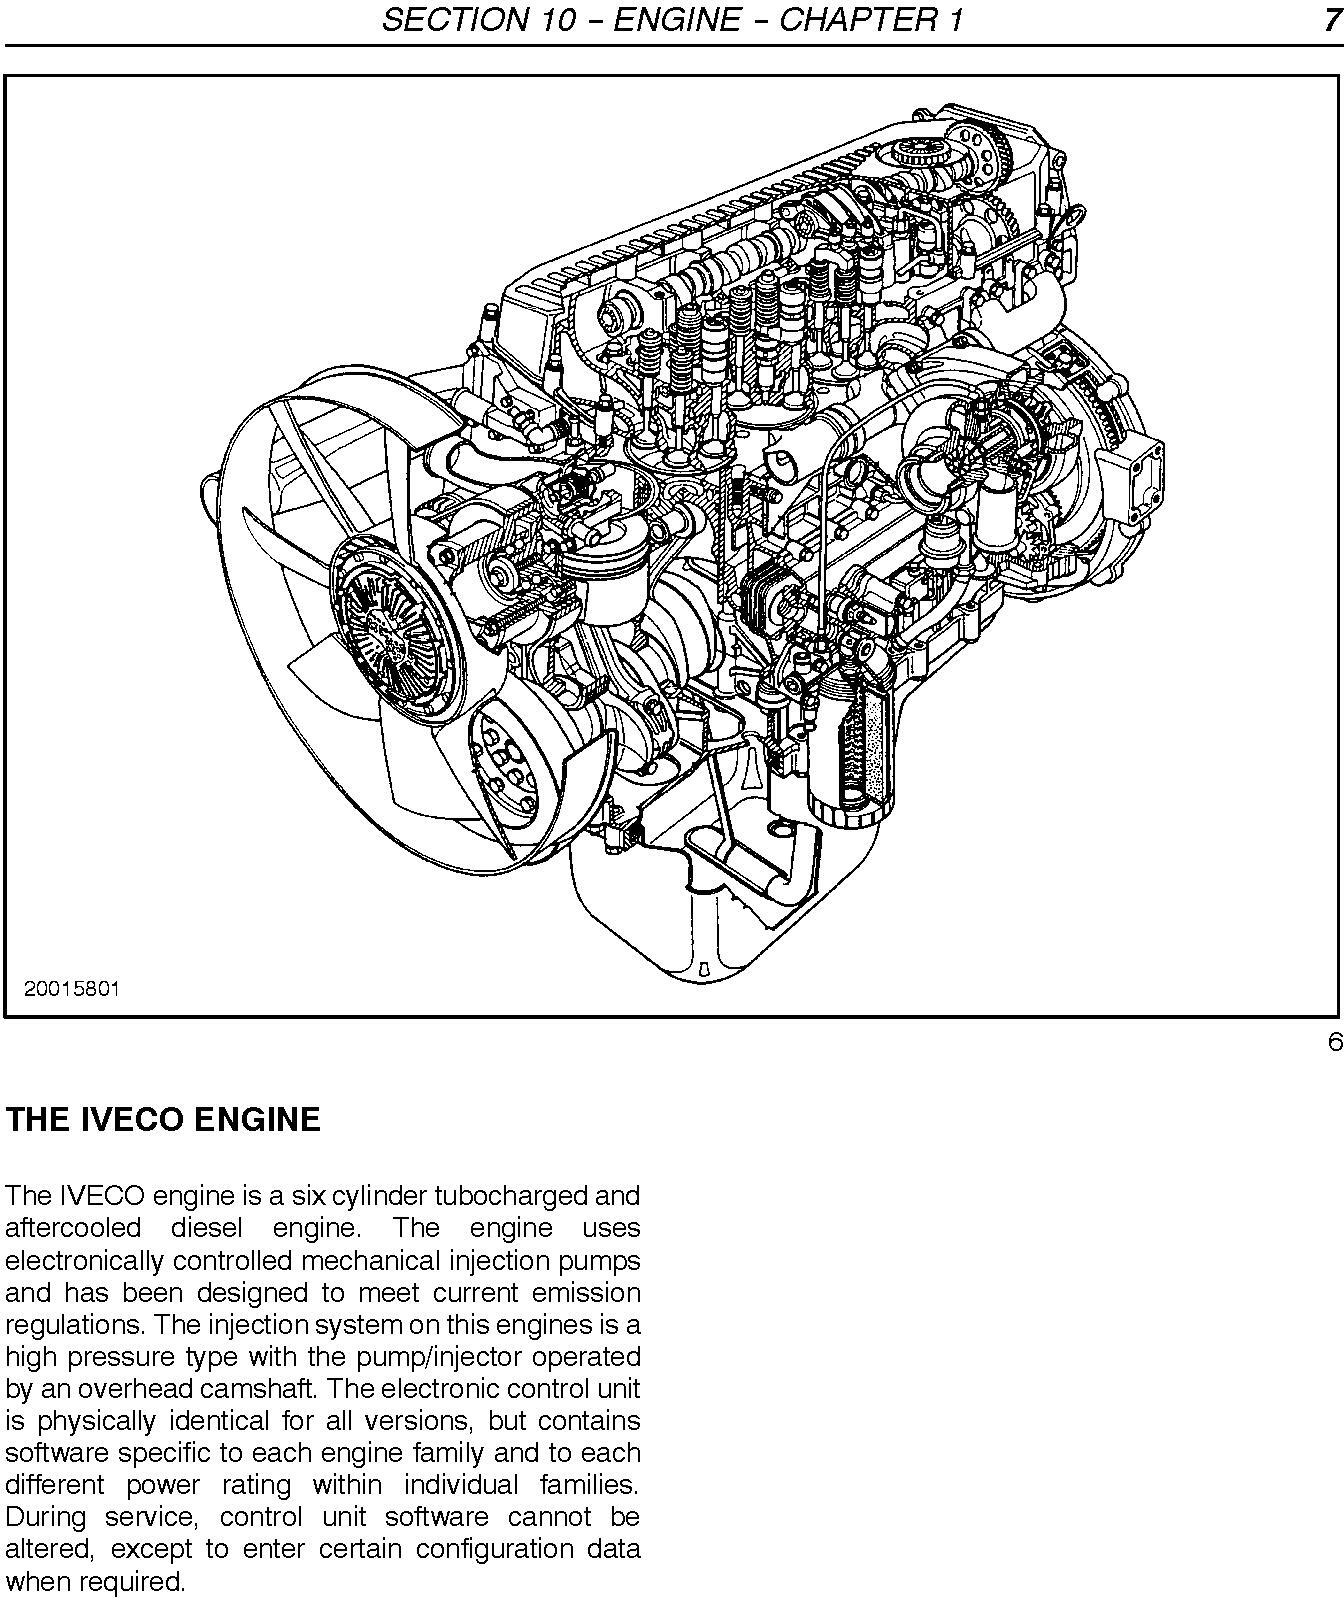 New Holland FX30 FX40 FX50 FX60 SP Forage Harvester Service Manual - 1